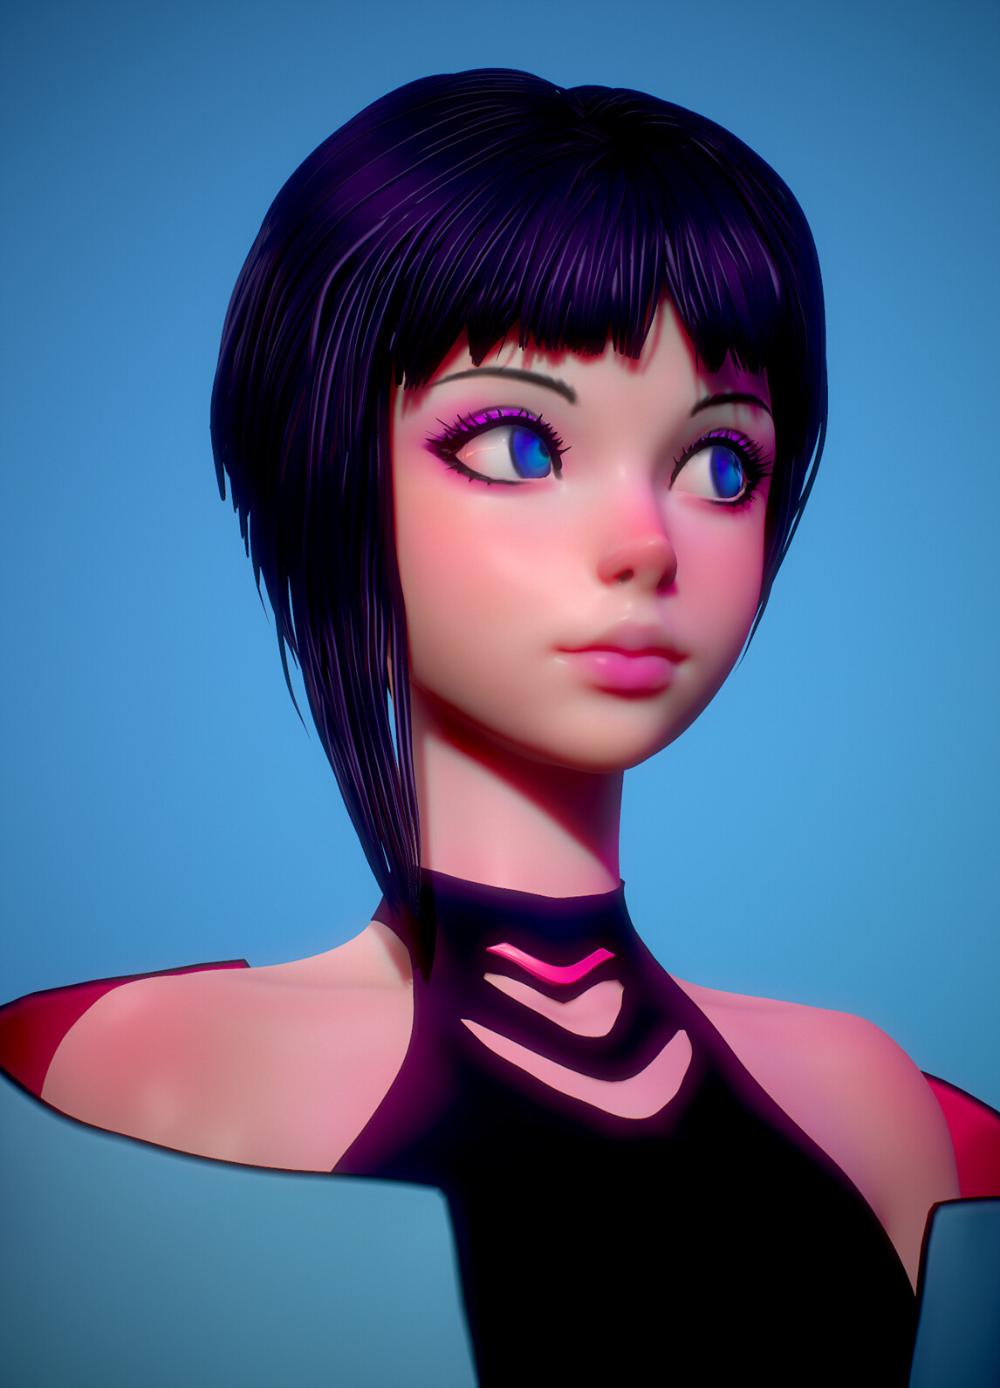 ArtStation - Anime-girl, Olya Anufrieva